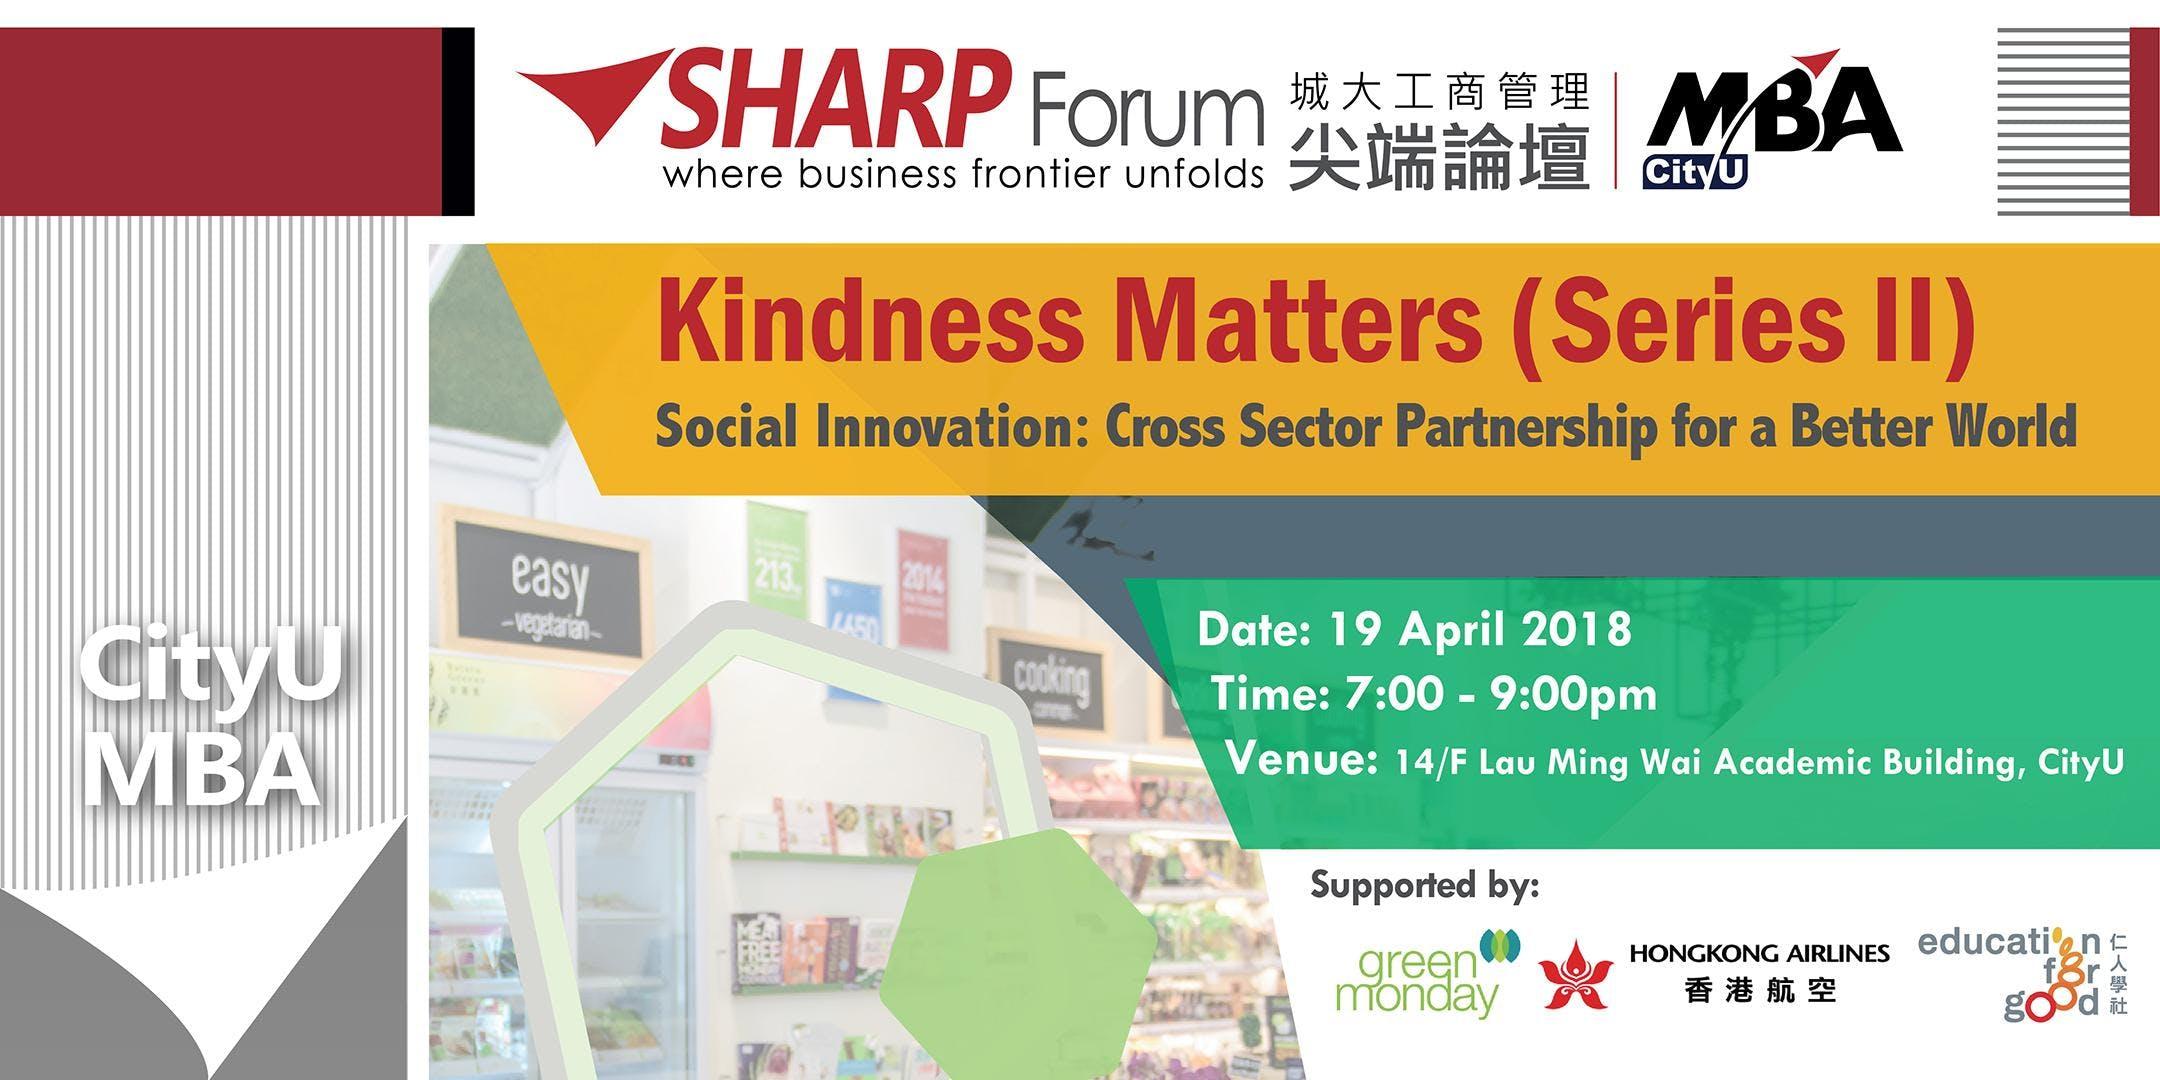 CityU MBA SHARP Forum: Kindness Matter (Series II) - Social